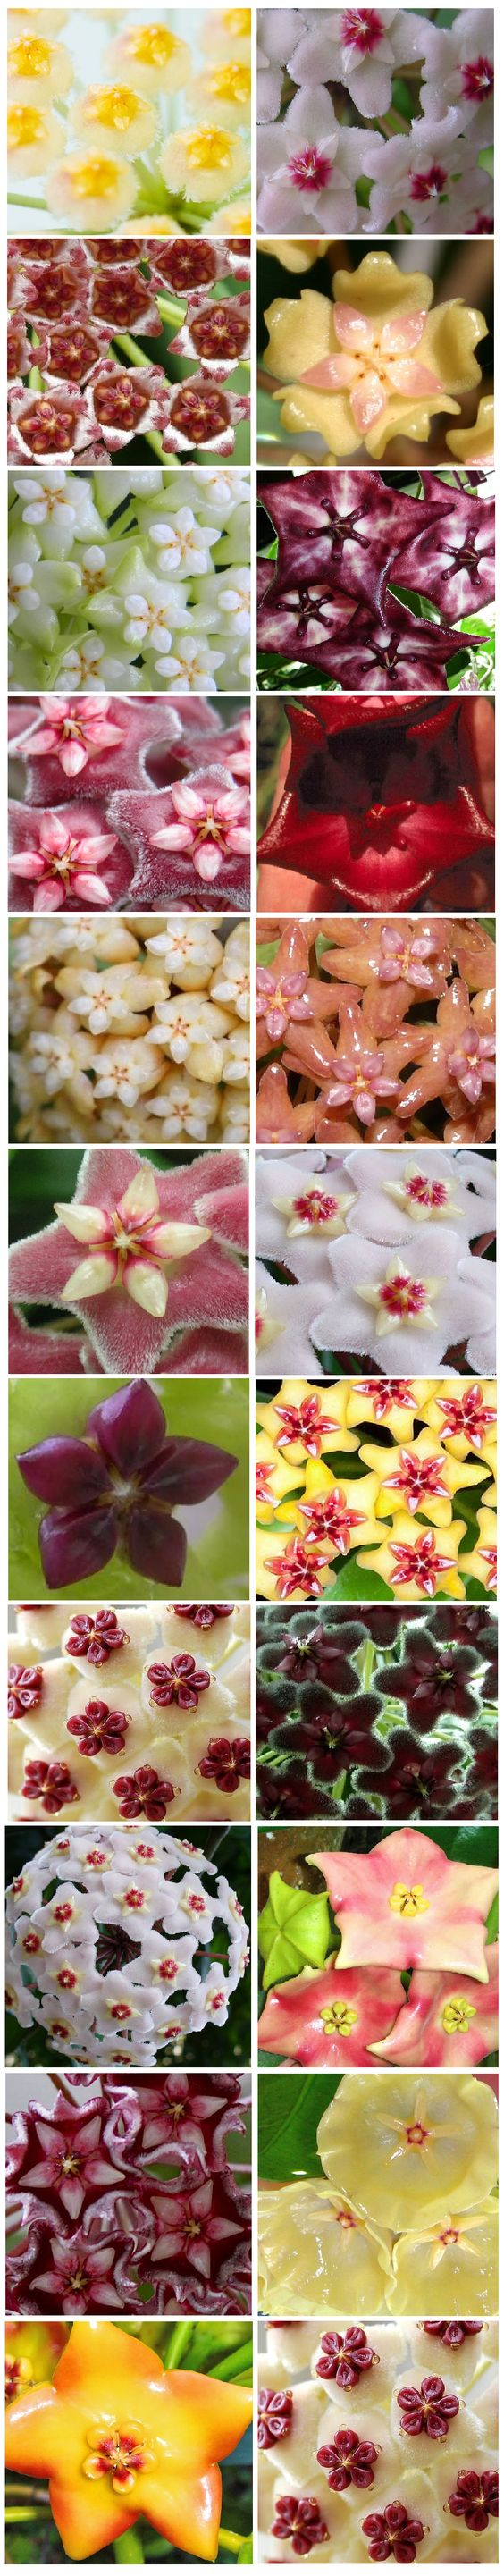 "Hoya, ""wax"" plant. Diversity Collection"